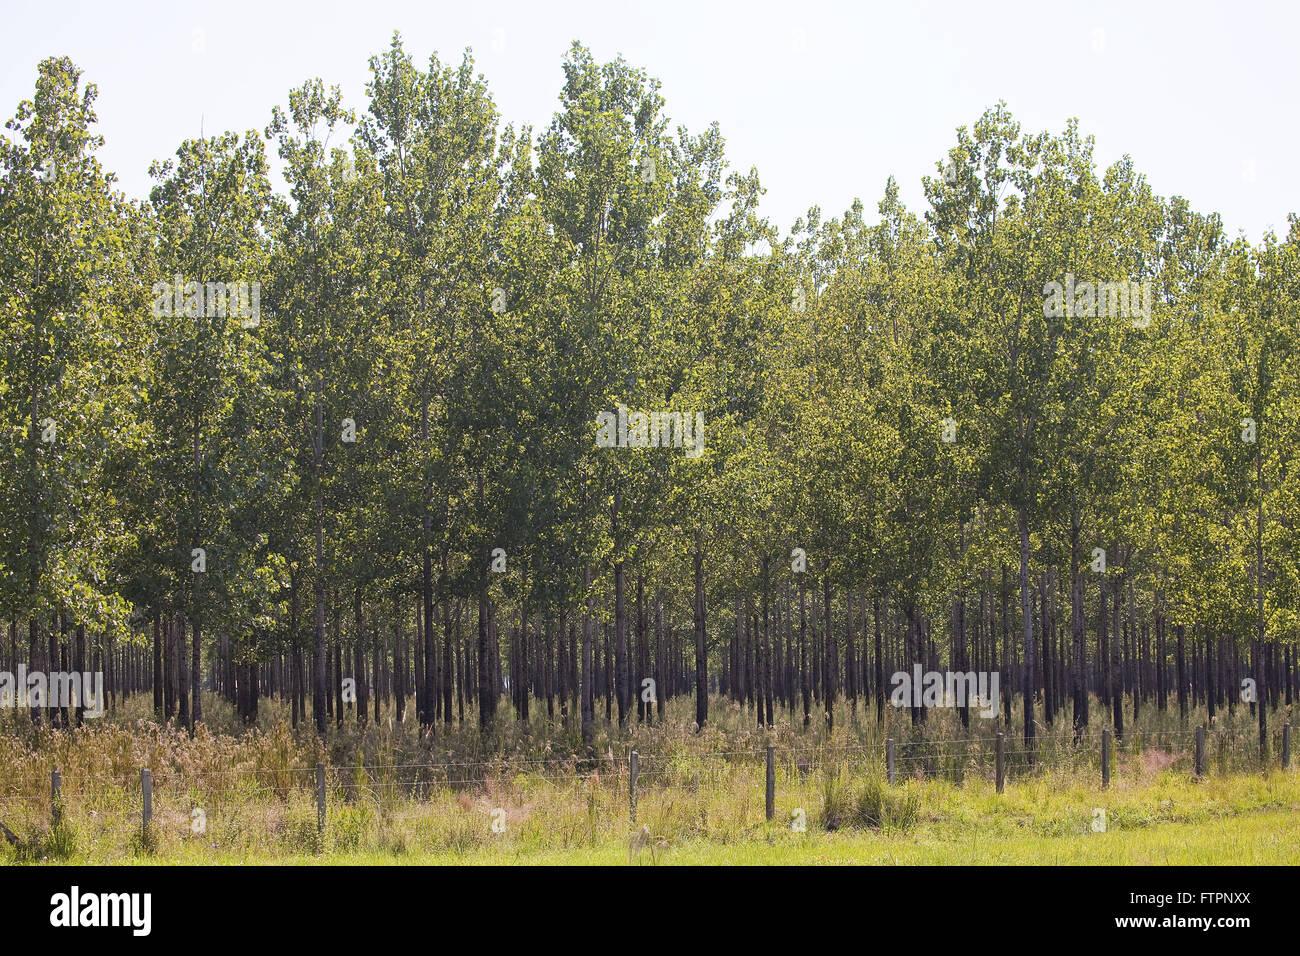 Alamo plantation for production of toothpick - Stock Image